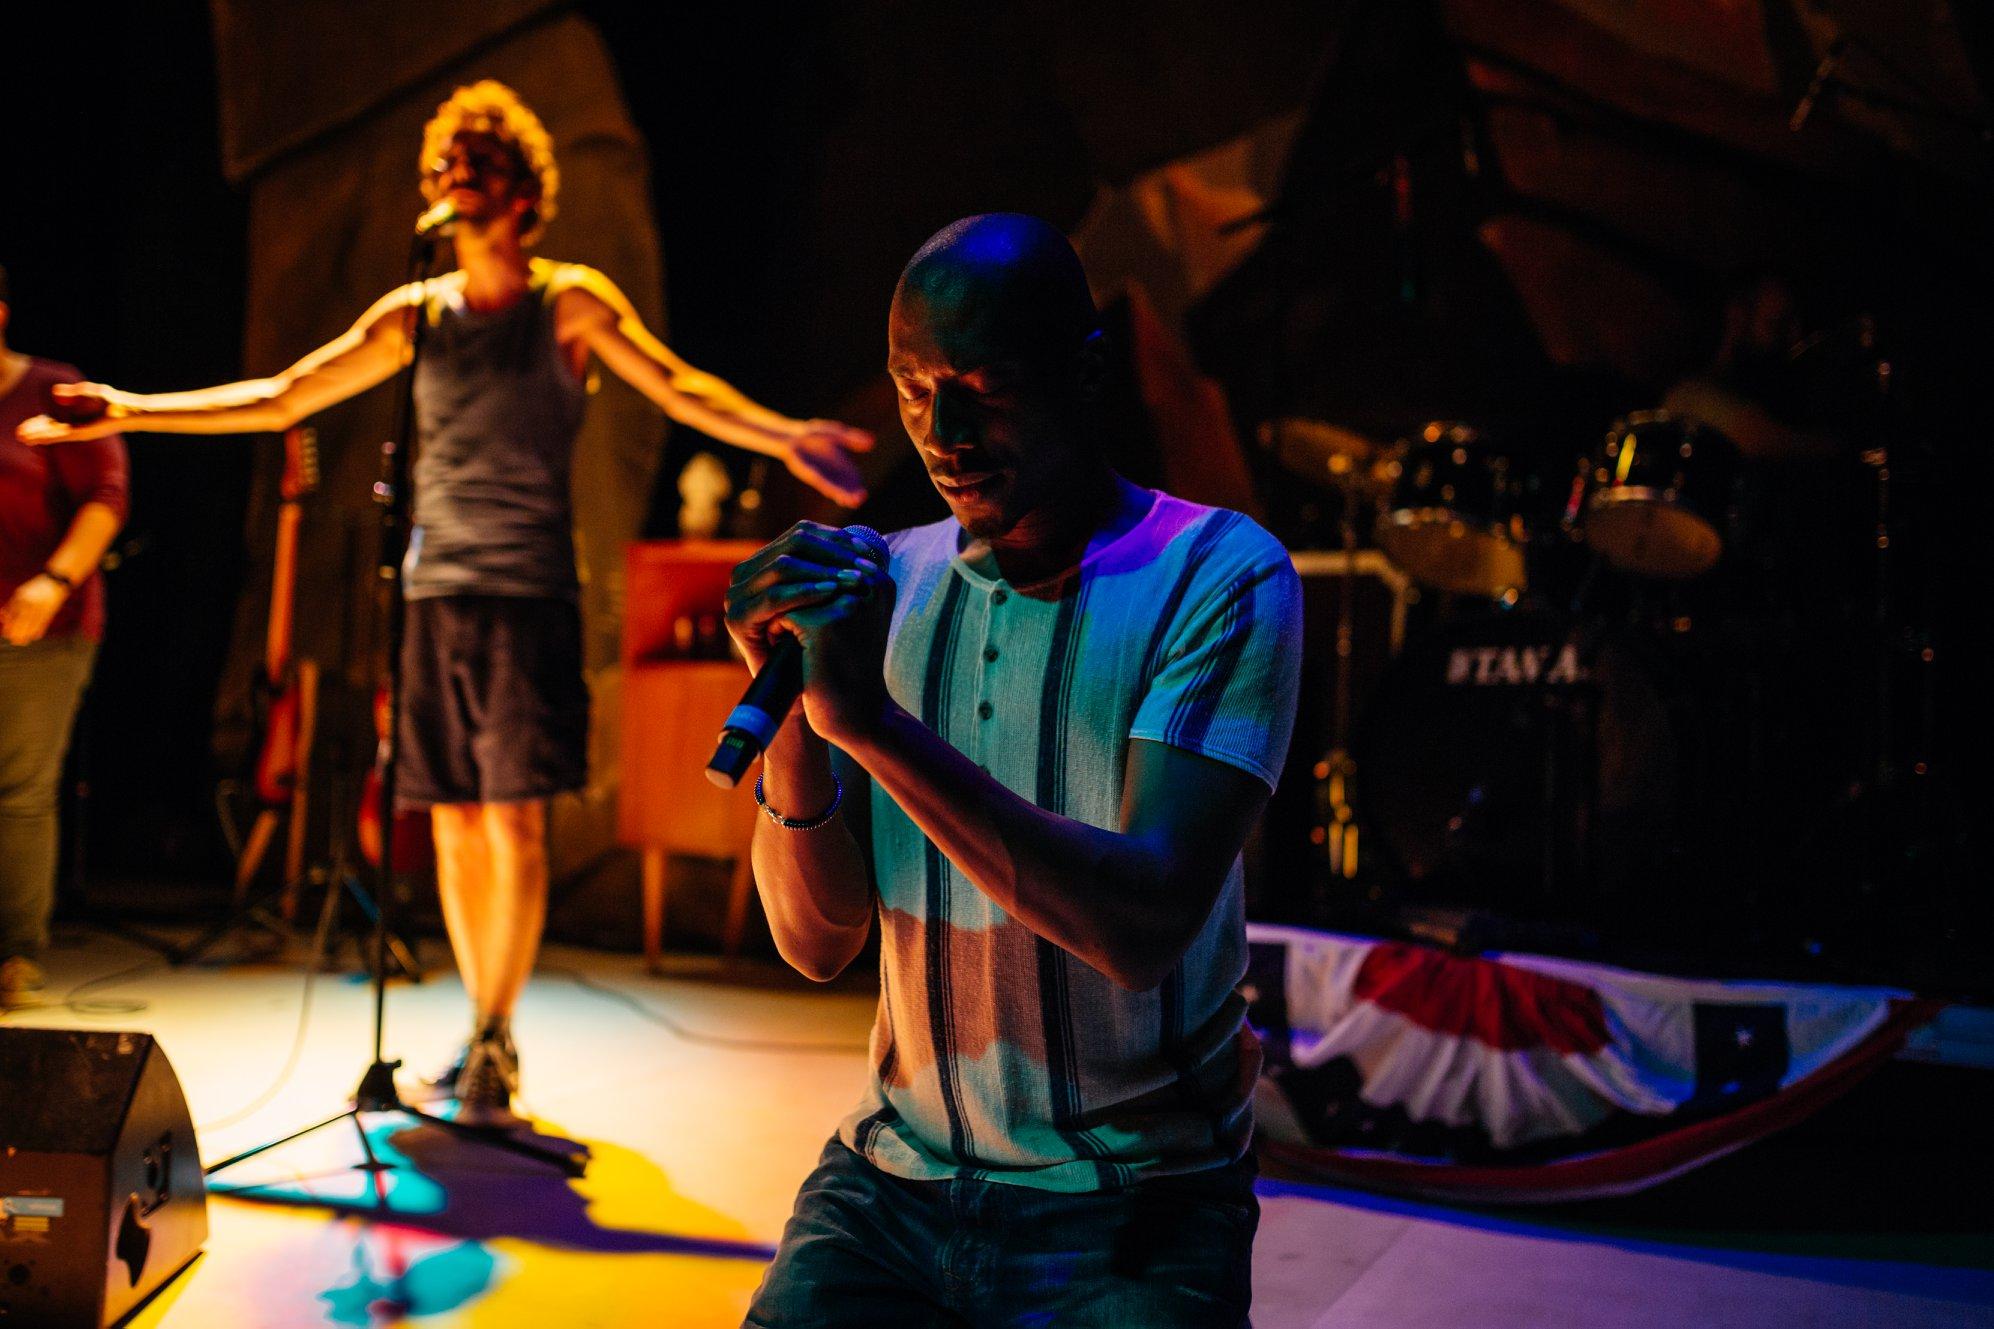 Theatre_Cosmik Debris (c) Agence Culturelle Grand Est - V. Muller_szenik-La Filature-Mulhouse